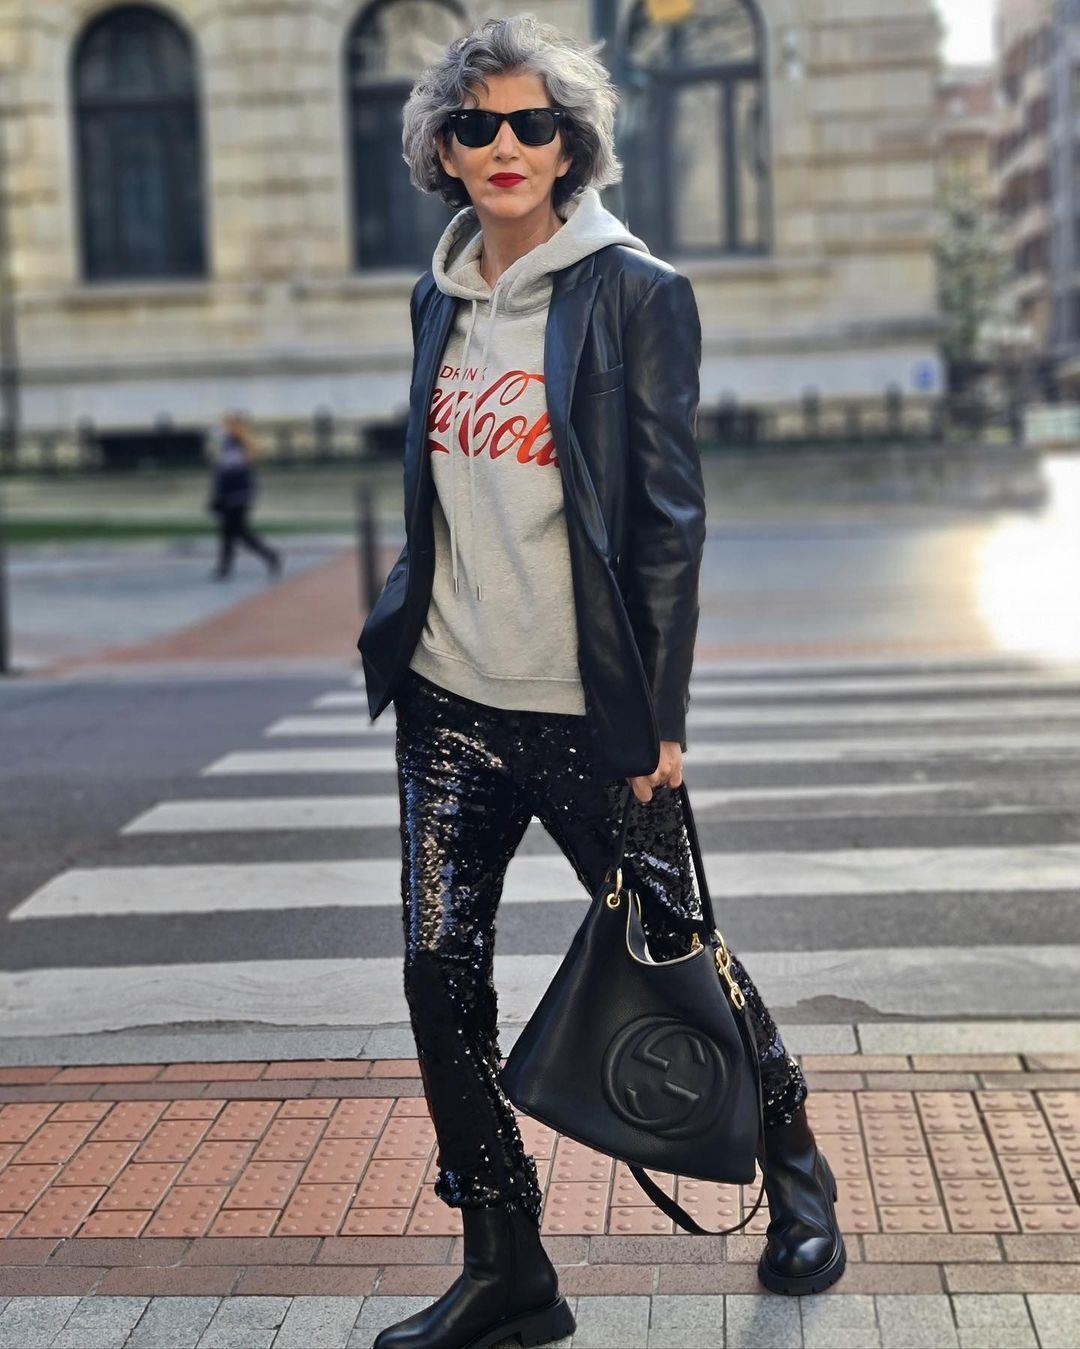 Carmen Gimeno2. Carmen Gimeno's look with sequin pants